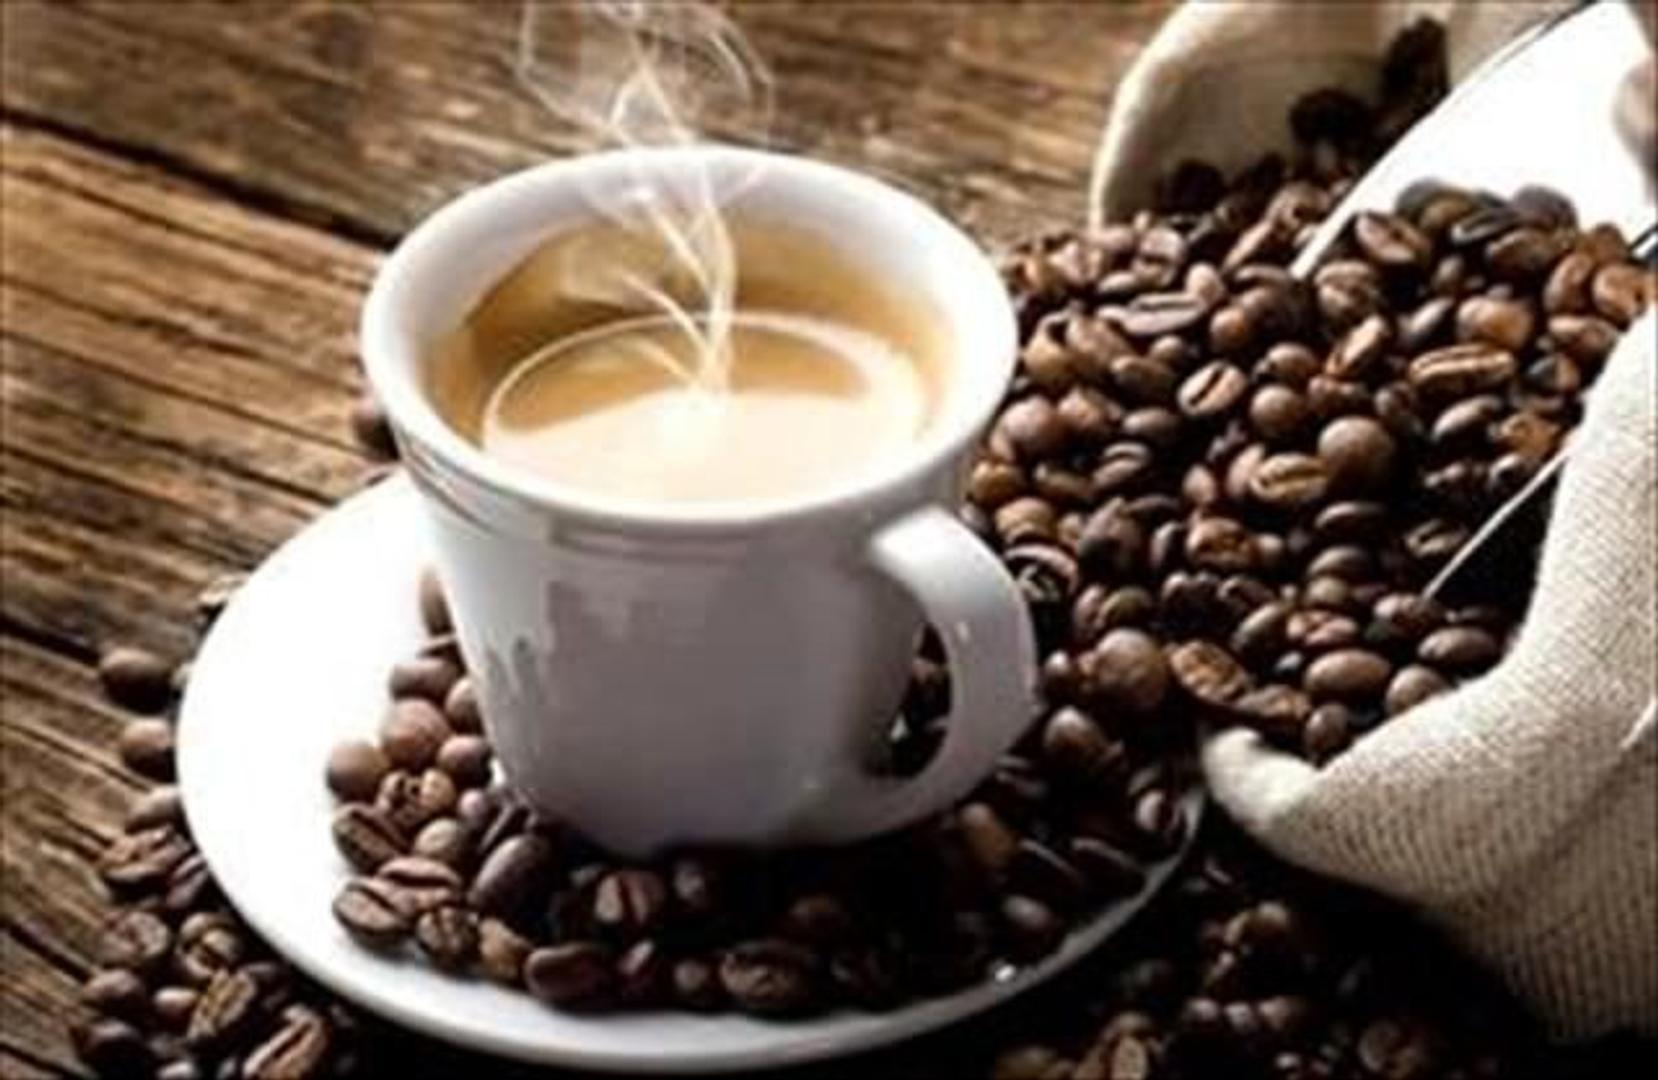 Franquicia de café muy reconocida